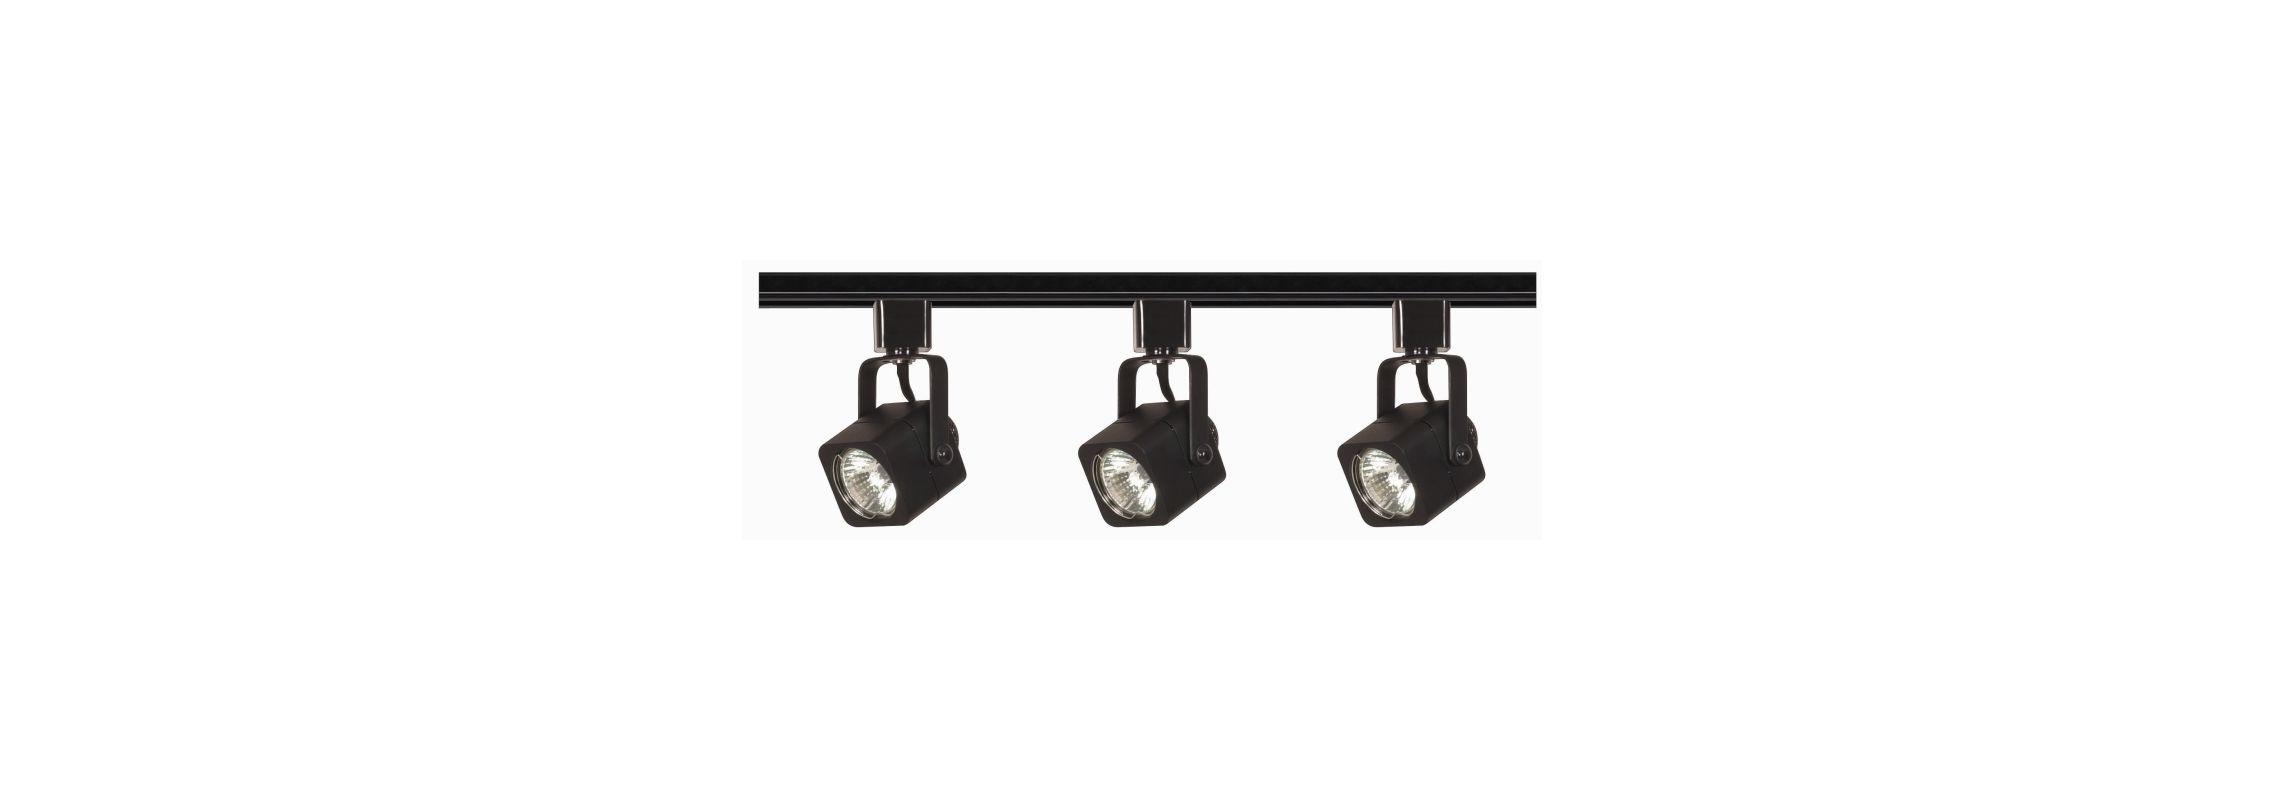 Nuvo Lighting TK346 Black Track Lighting Three Light MR16 Square 120V Track Kit in Black Finish